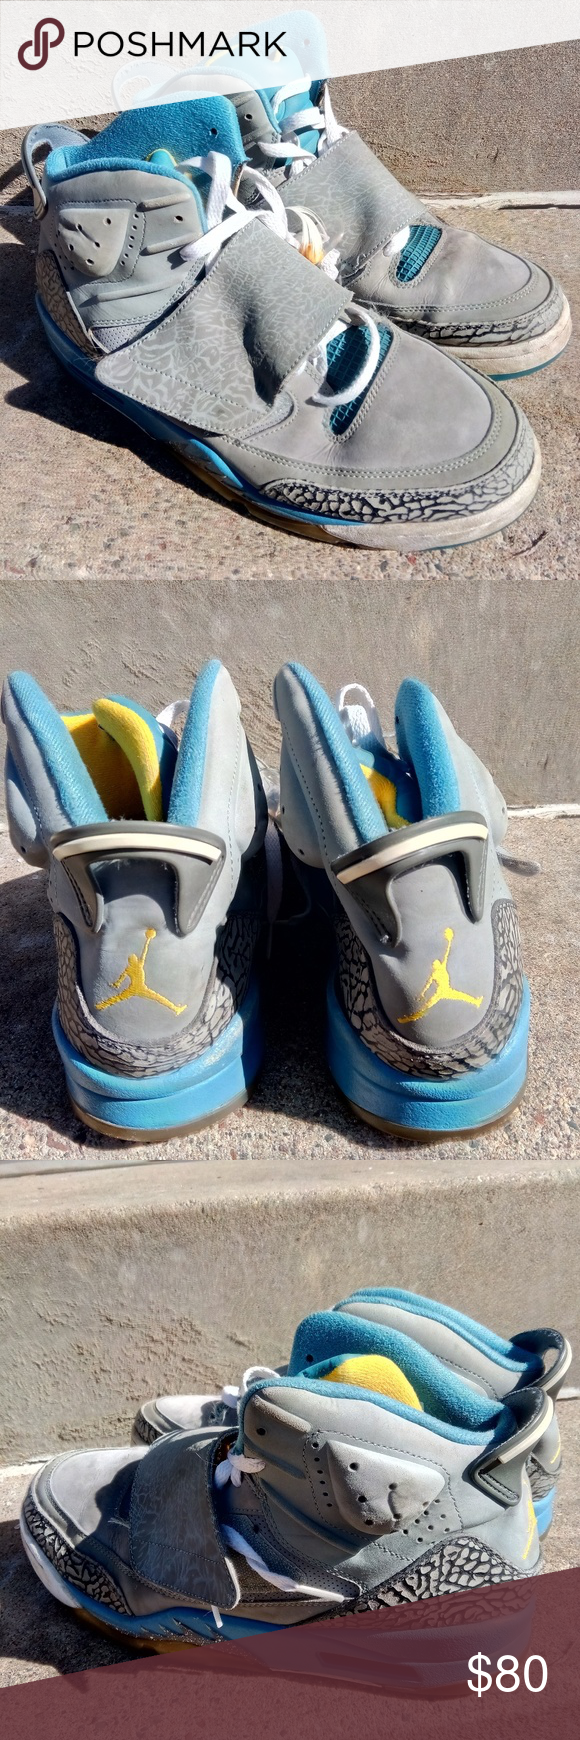 50968e89dfe Nike Air Jordan Son Of Mars Size 11 Air Jordan Son Of Mars Shaded Blue  512245